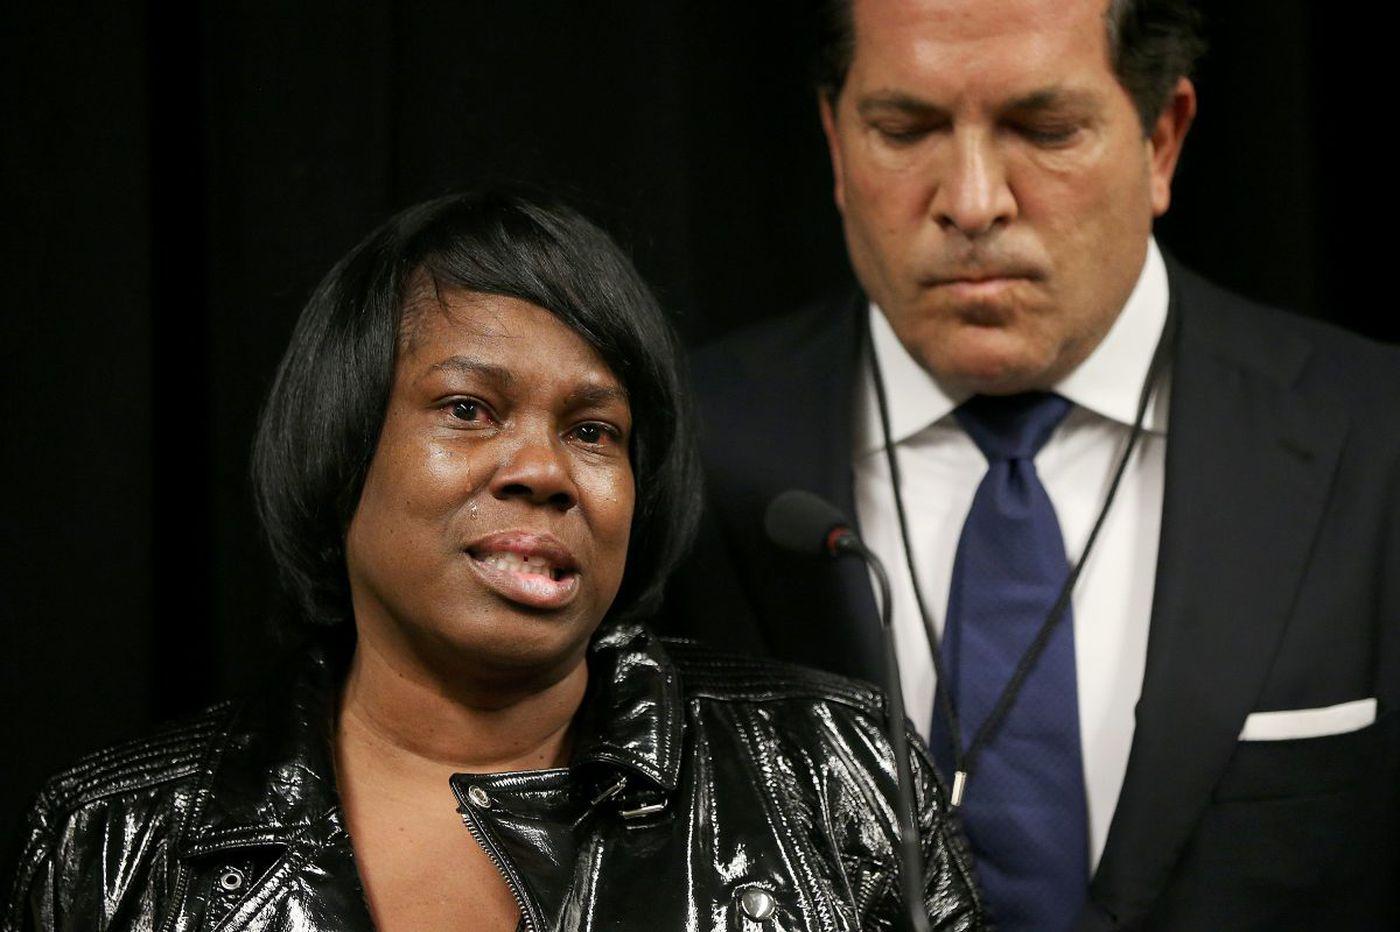 Meek Mill's mother begs DA Krasner to resolve her son's case